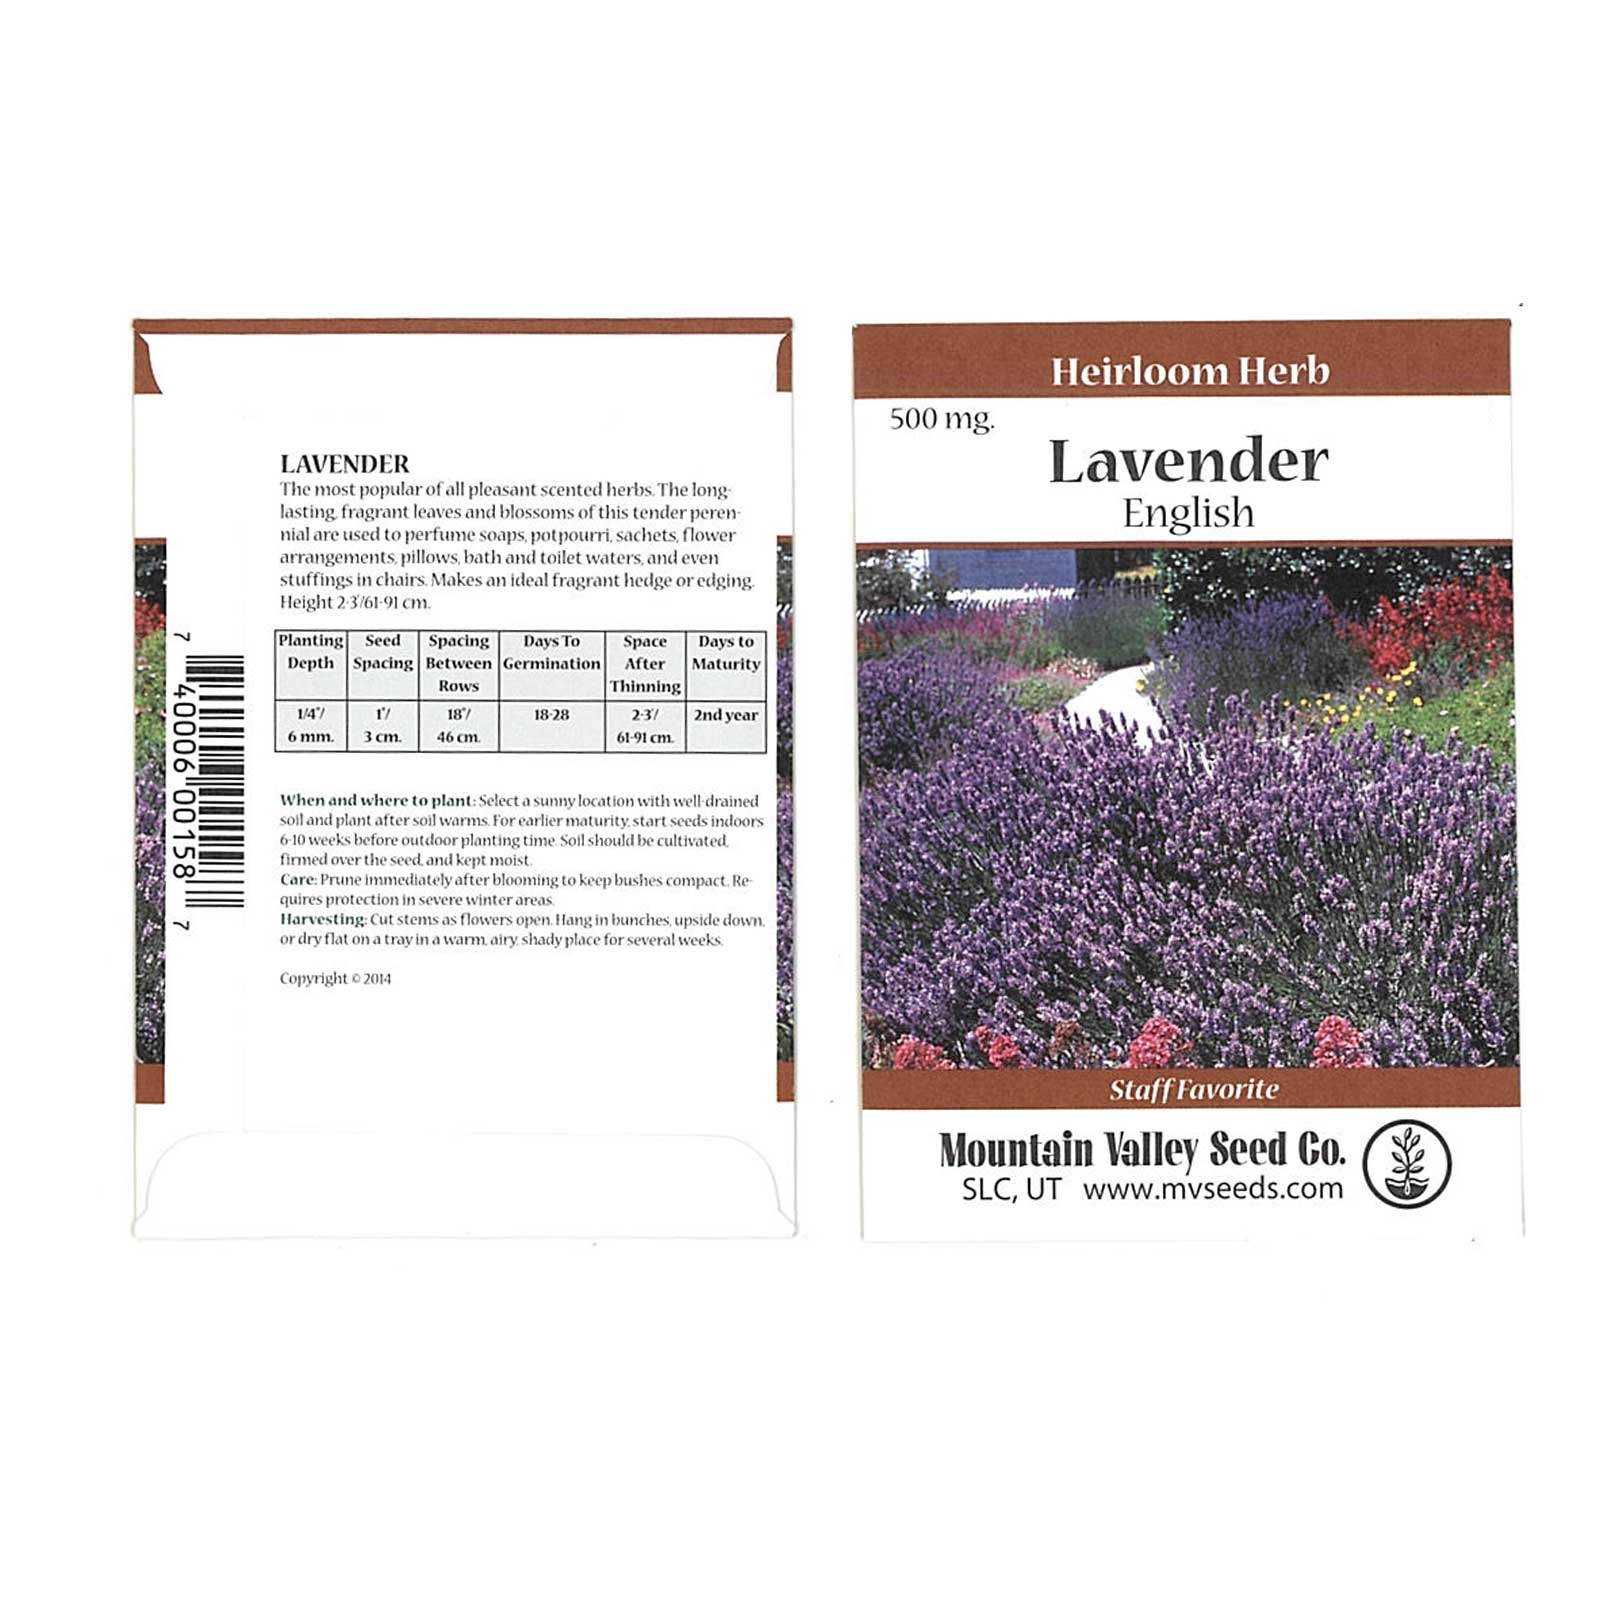 Common English Lavender Flower Garden Seeds - 500 Mg Packet - Perennial Herb Gardening Seeds - Lavandula angustifolia